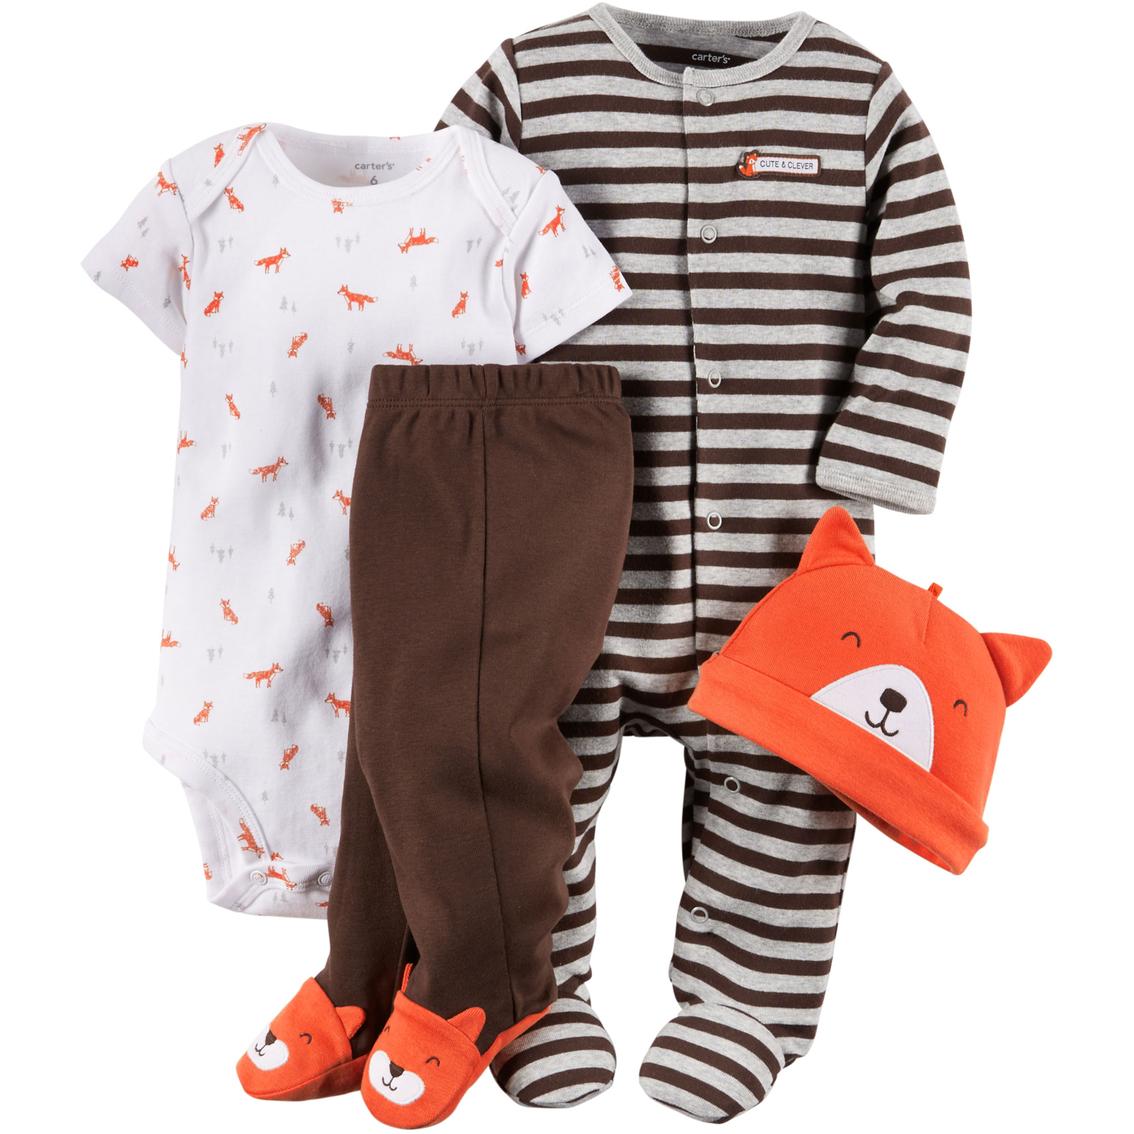 fa2ccf3b8 Carter s Infant Boys Fox Layette 4 Pc. Set